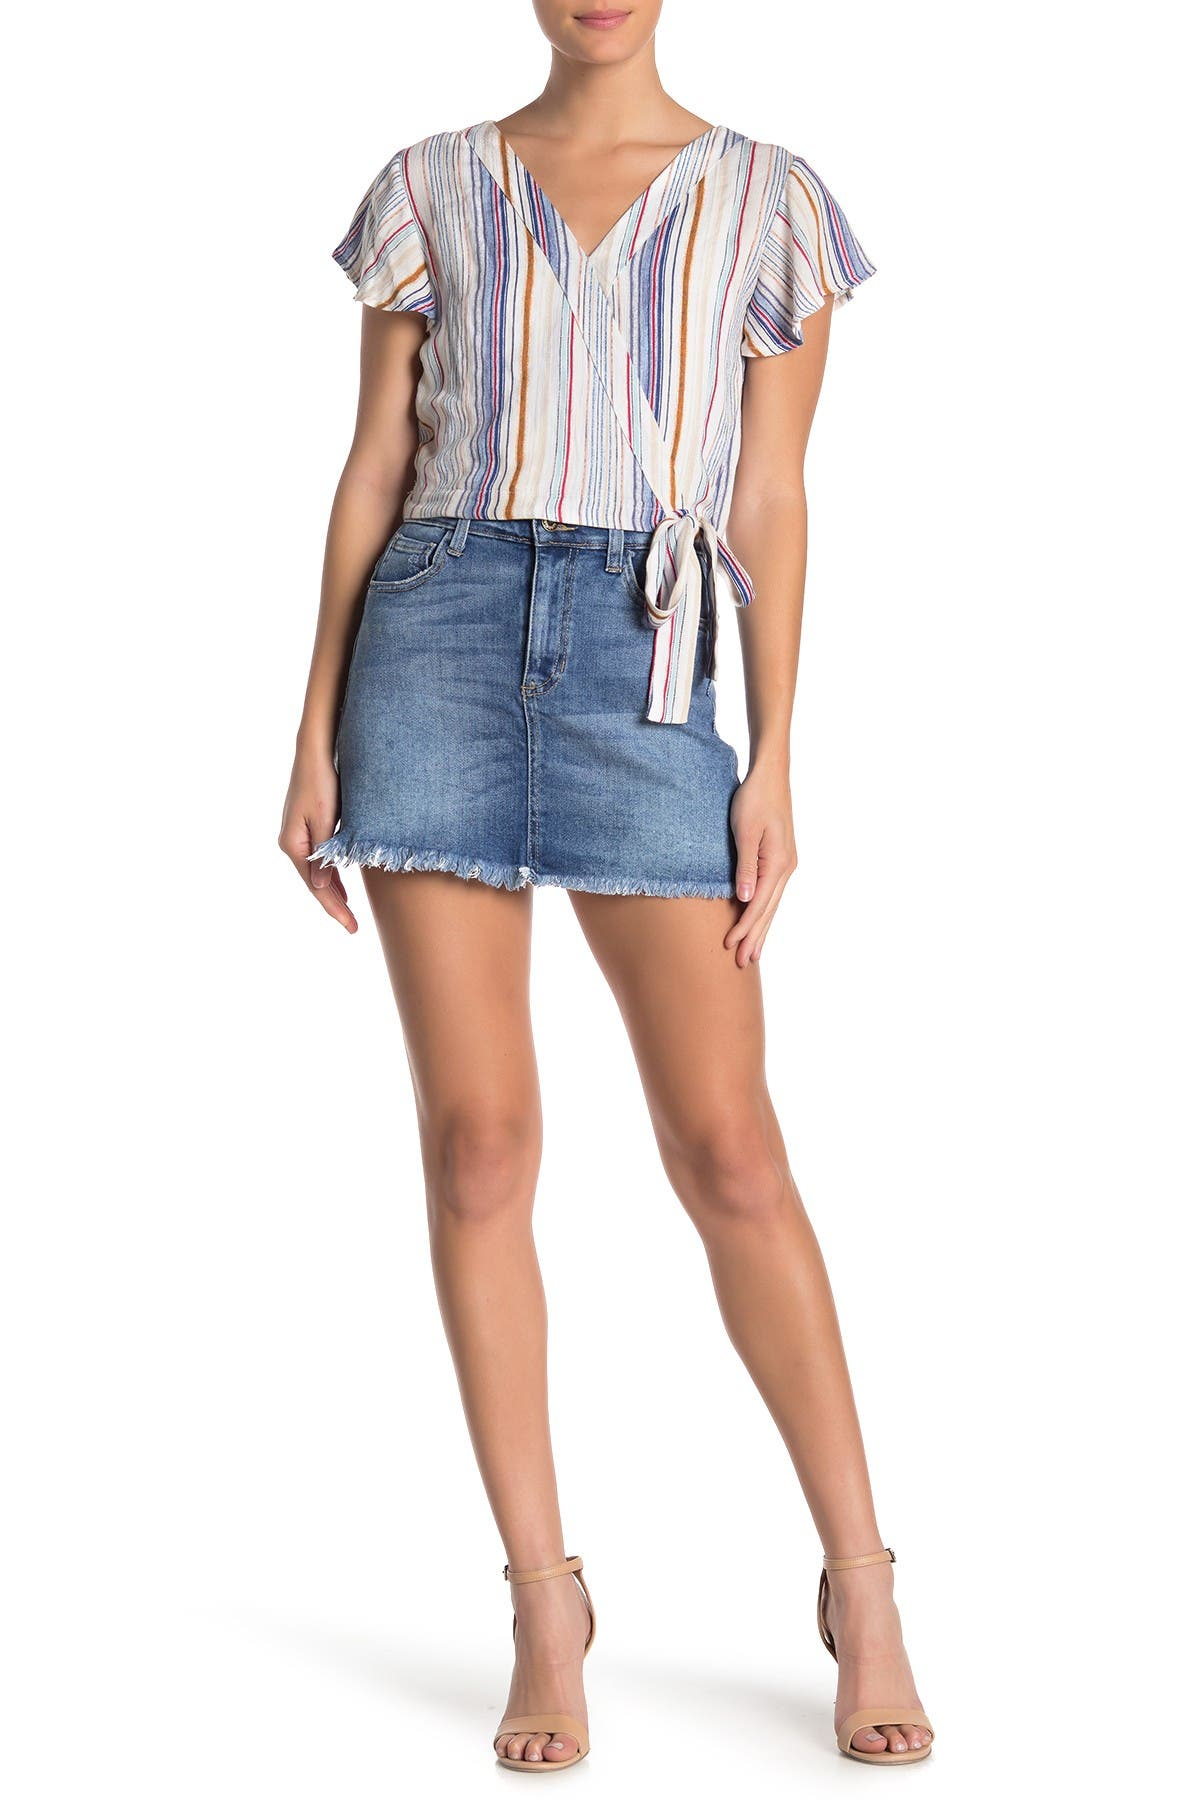 Image of Sneak Peek Denim A-Line Fray Hem Denim Mini Skirt